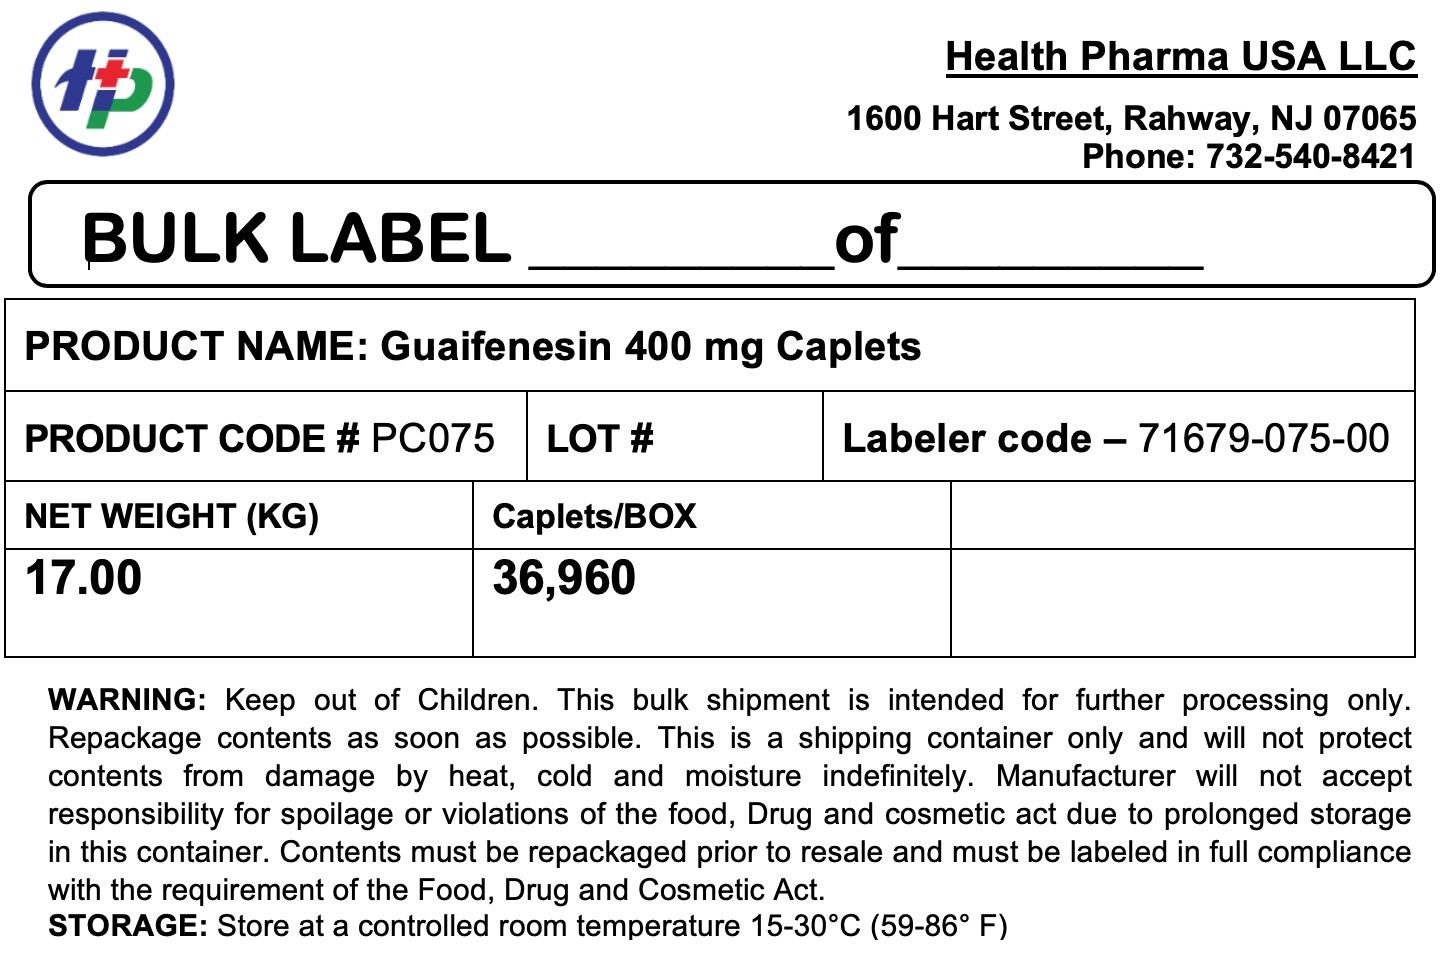 Guaifenesin 400 mg